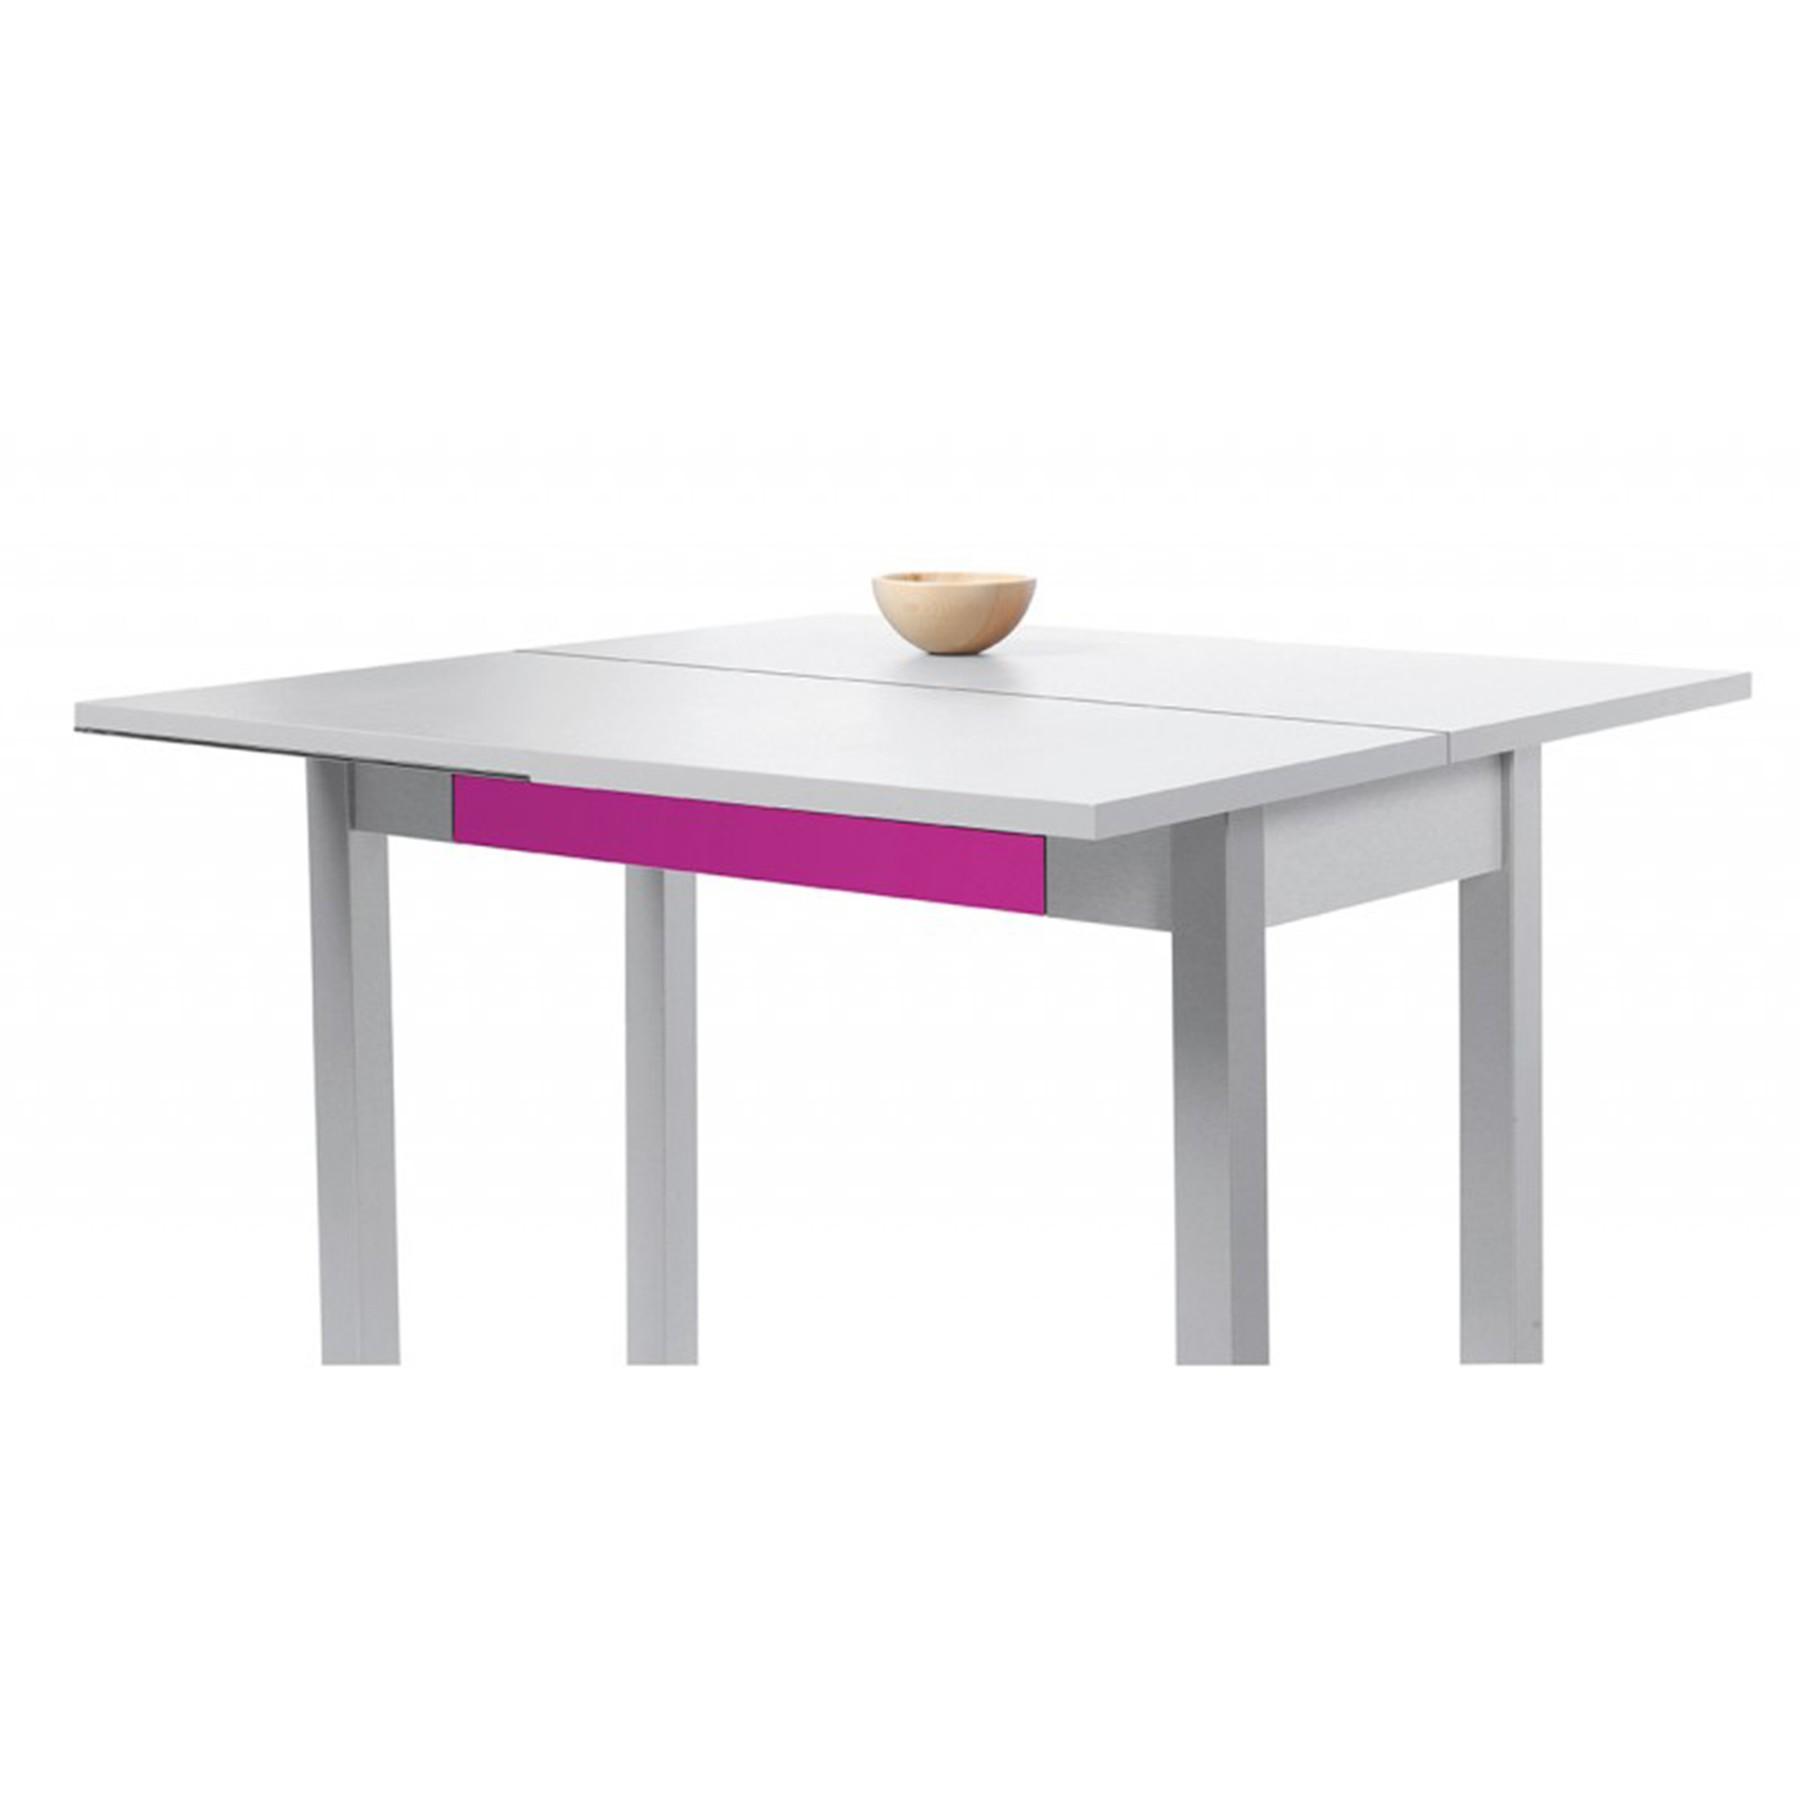 Conjunto de mesa libro y sillas de cocina modelo sunny - Mesas de libro para cocina ...